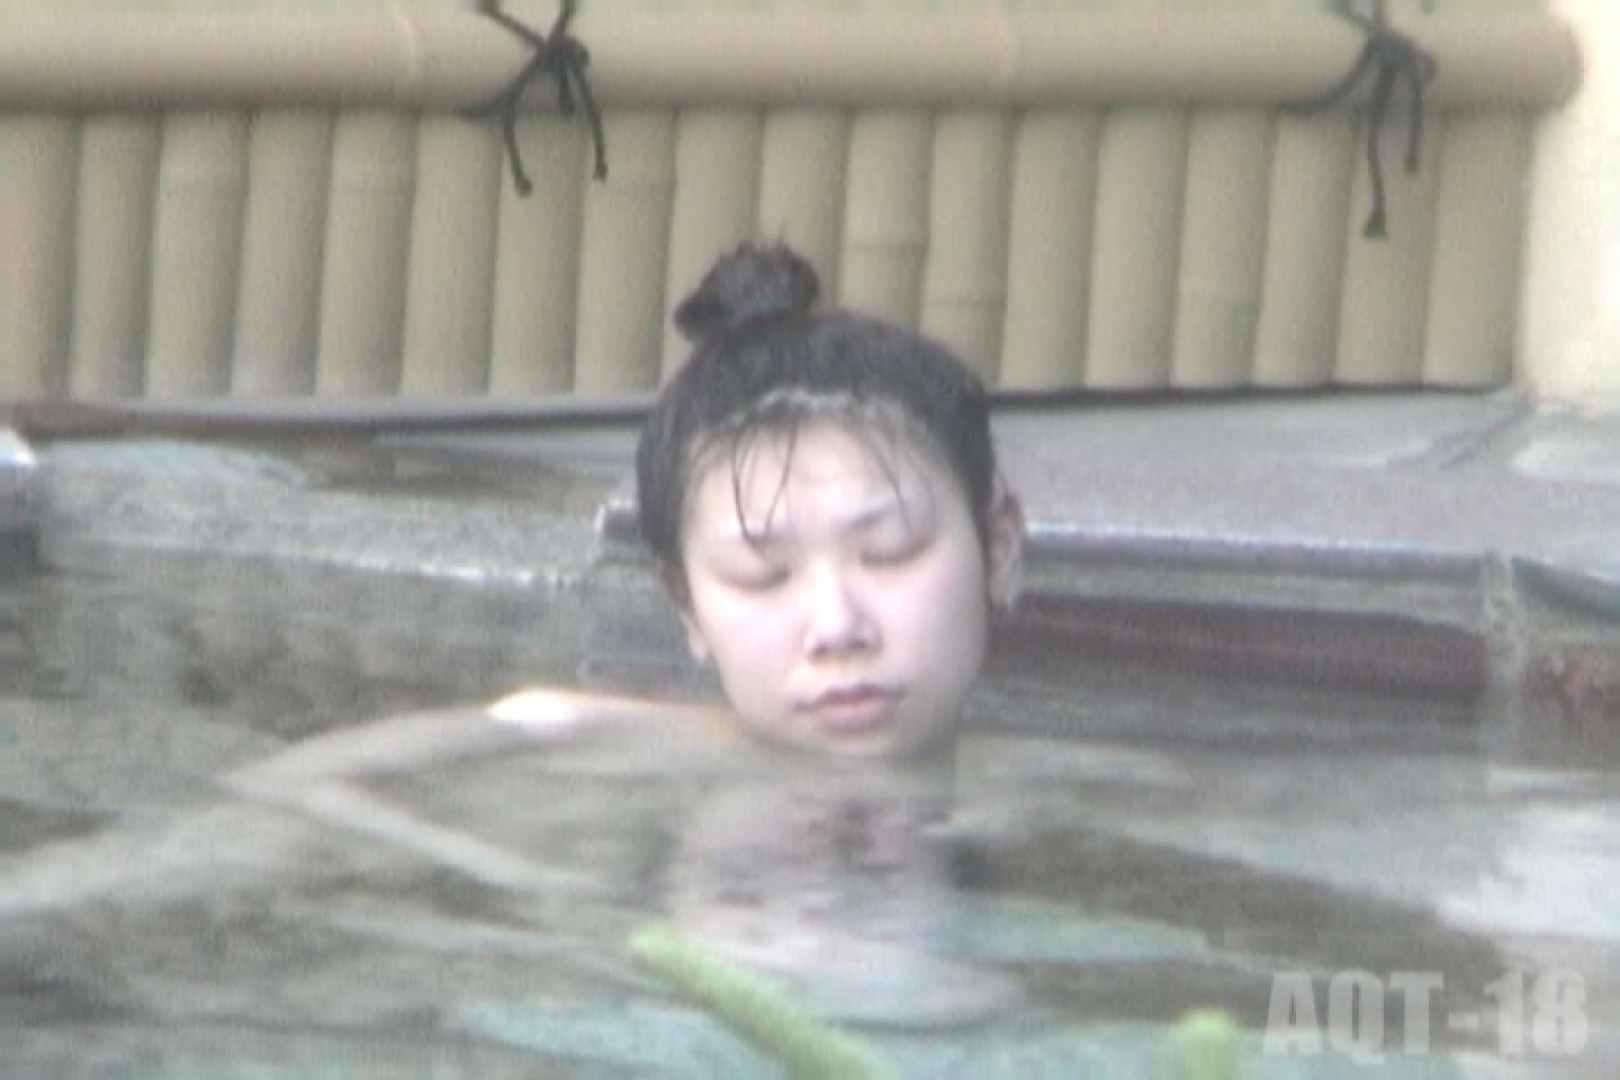 Aquaな露天風呂Vol.855 露天 | OLセックス  67画像 40